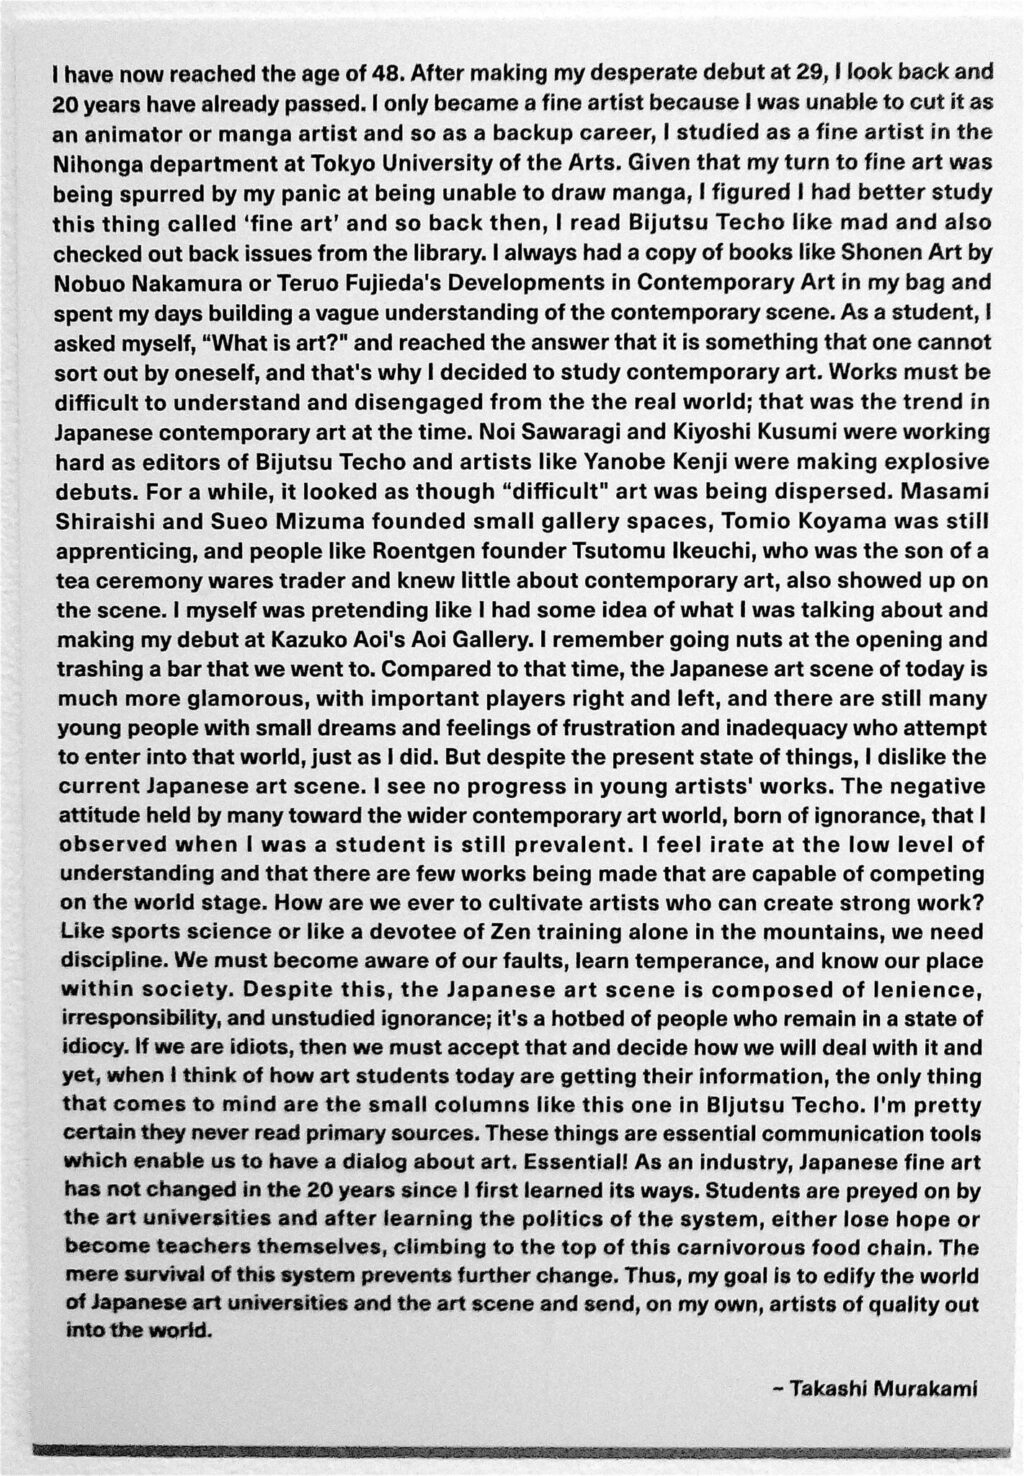 MURAKAMI Takashi 村上隆の五百羅漢図展 The 500 Arhats @ 森美術館 Mori Art Museum 2015 (18)